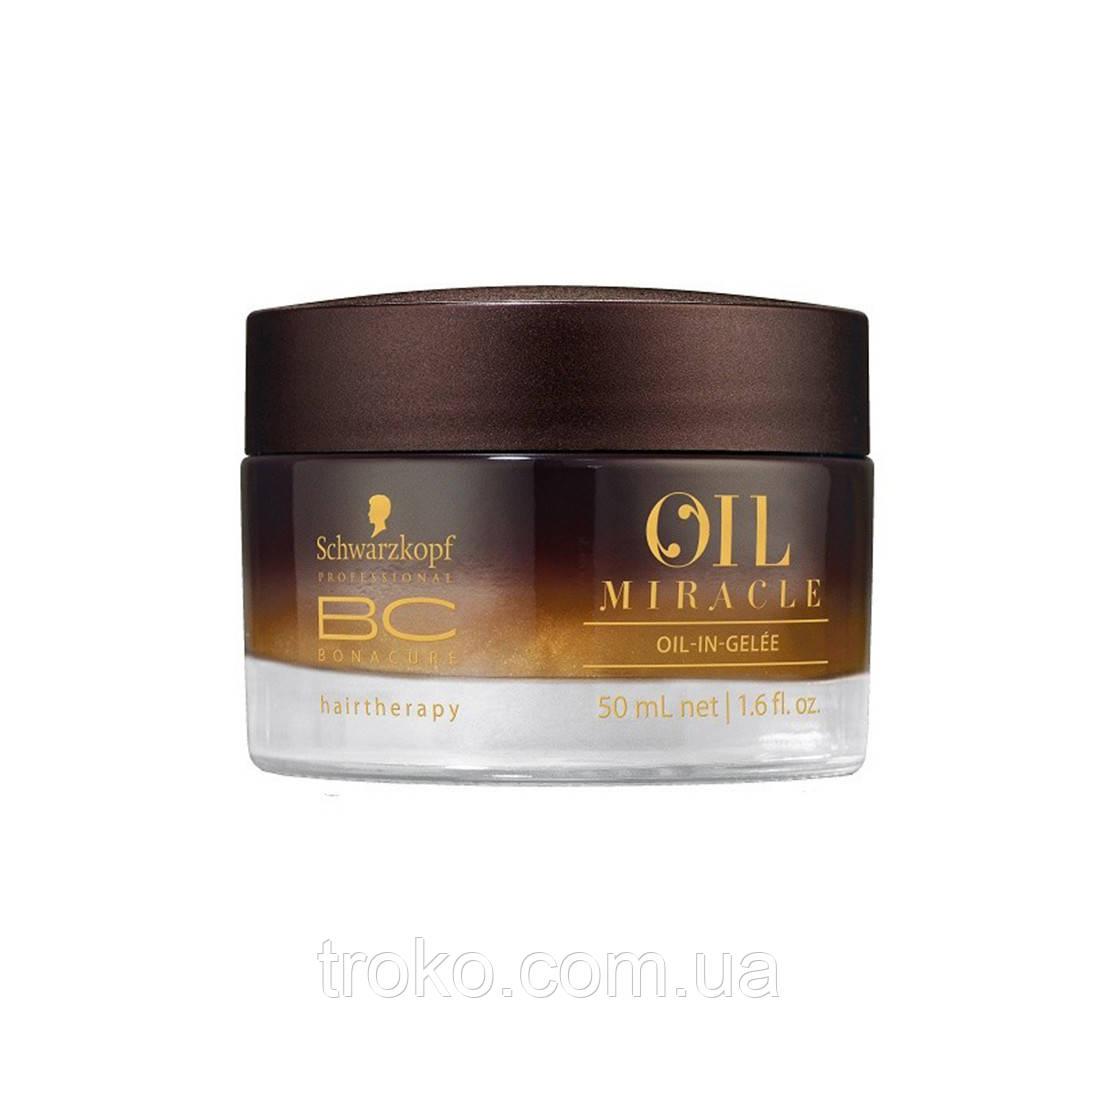 Schwarzkopf BC Oil-in-Gelee Масло-желе для финишного ухода и укладки волос, 50 мл